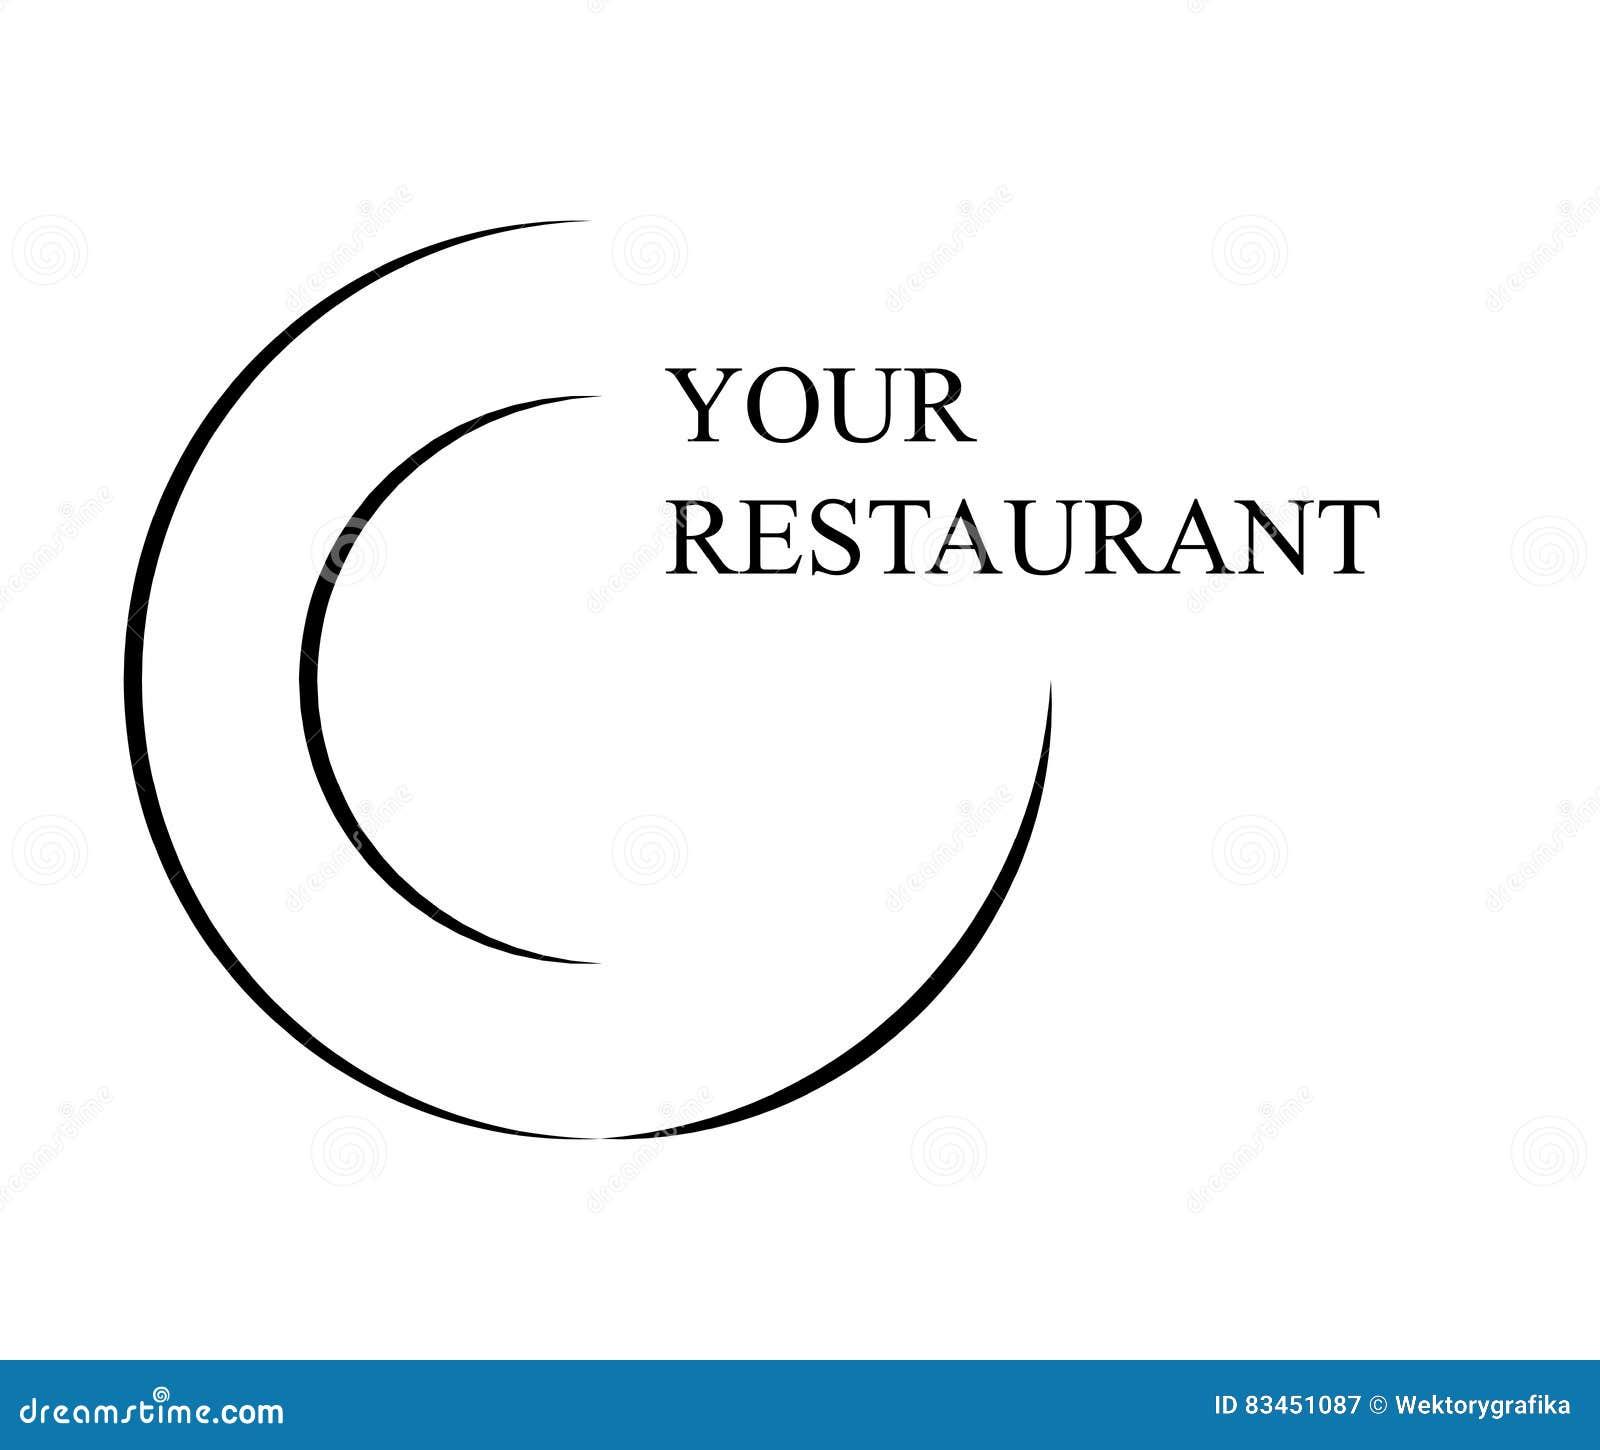 Restaurant logo vector symbol icon design.